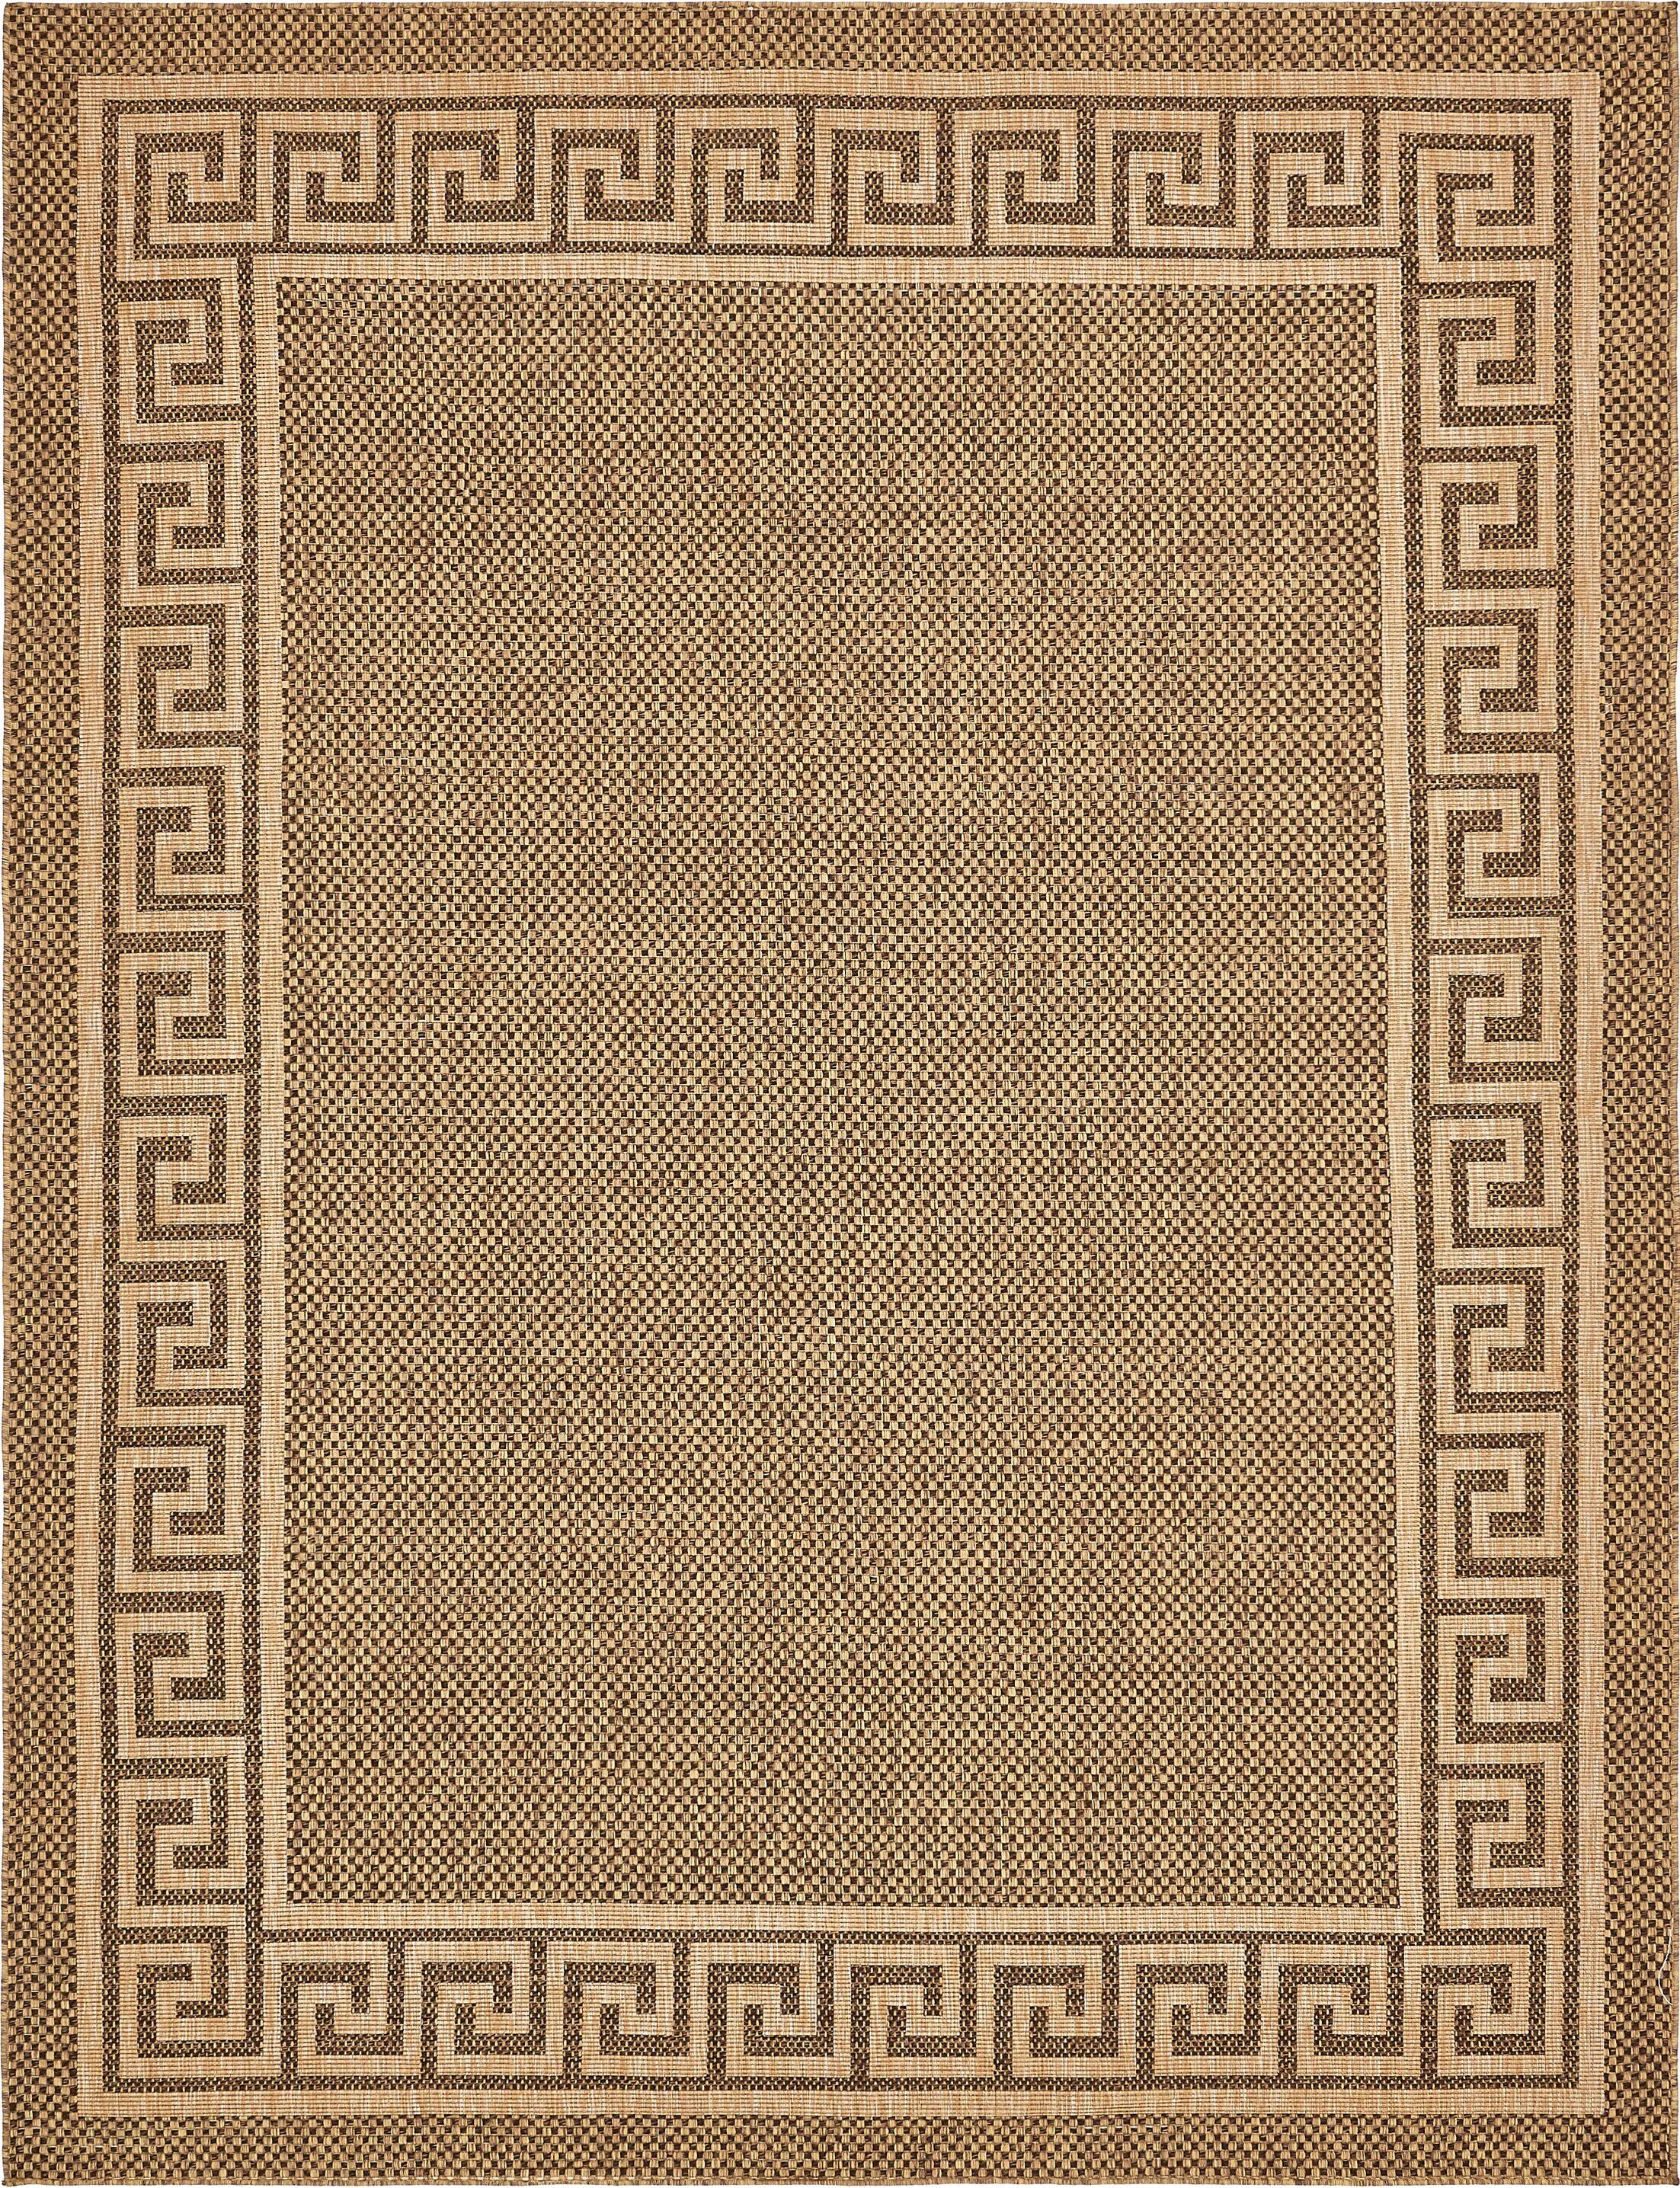 Flint Brown Outdoor Area Rug Rug Size: Rectangle 9' x 12'